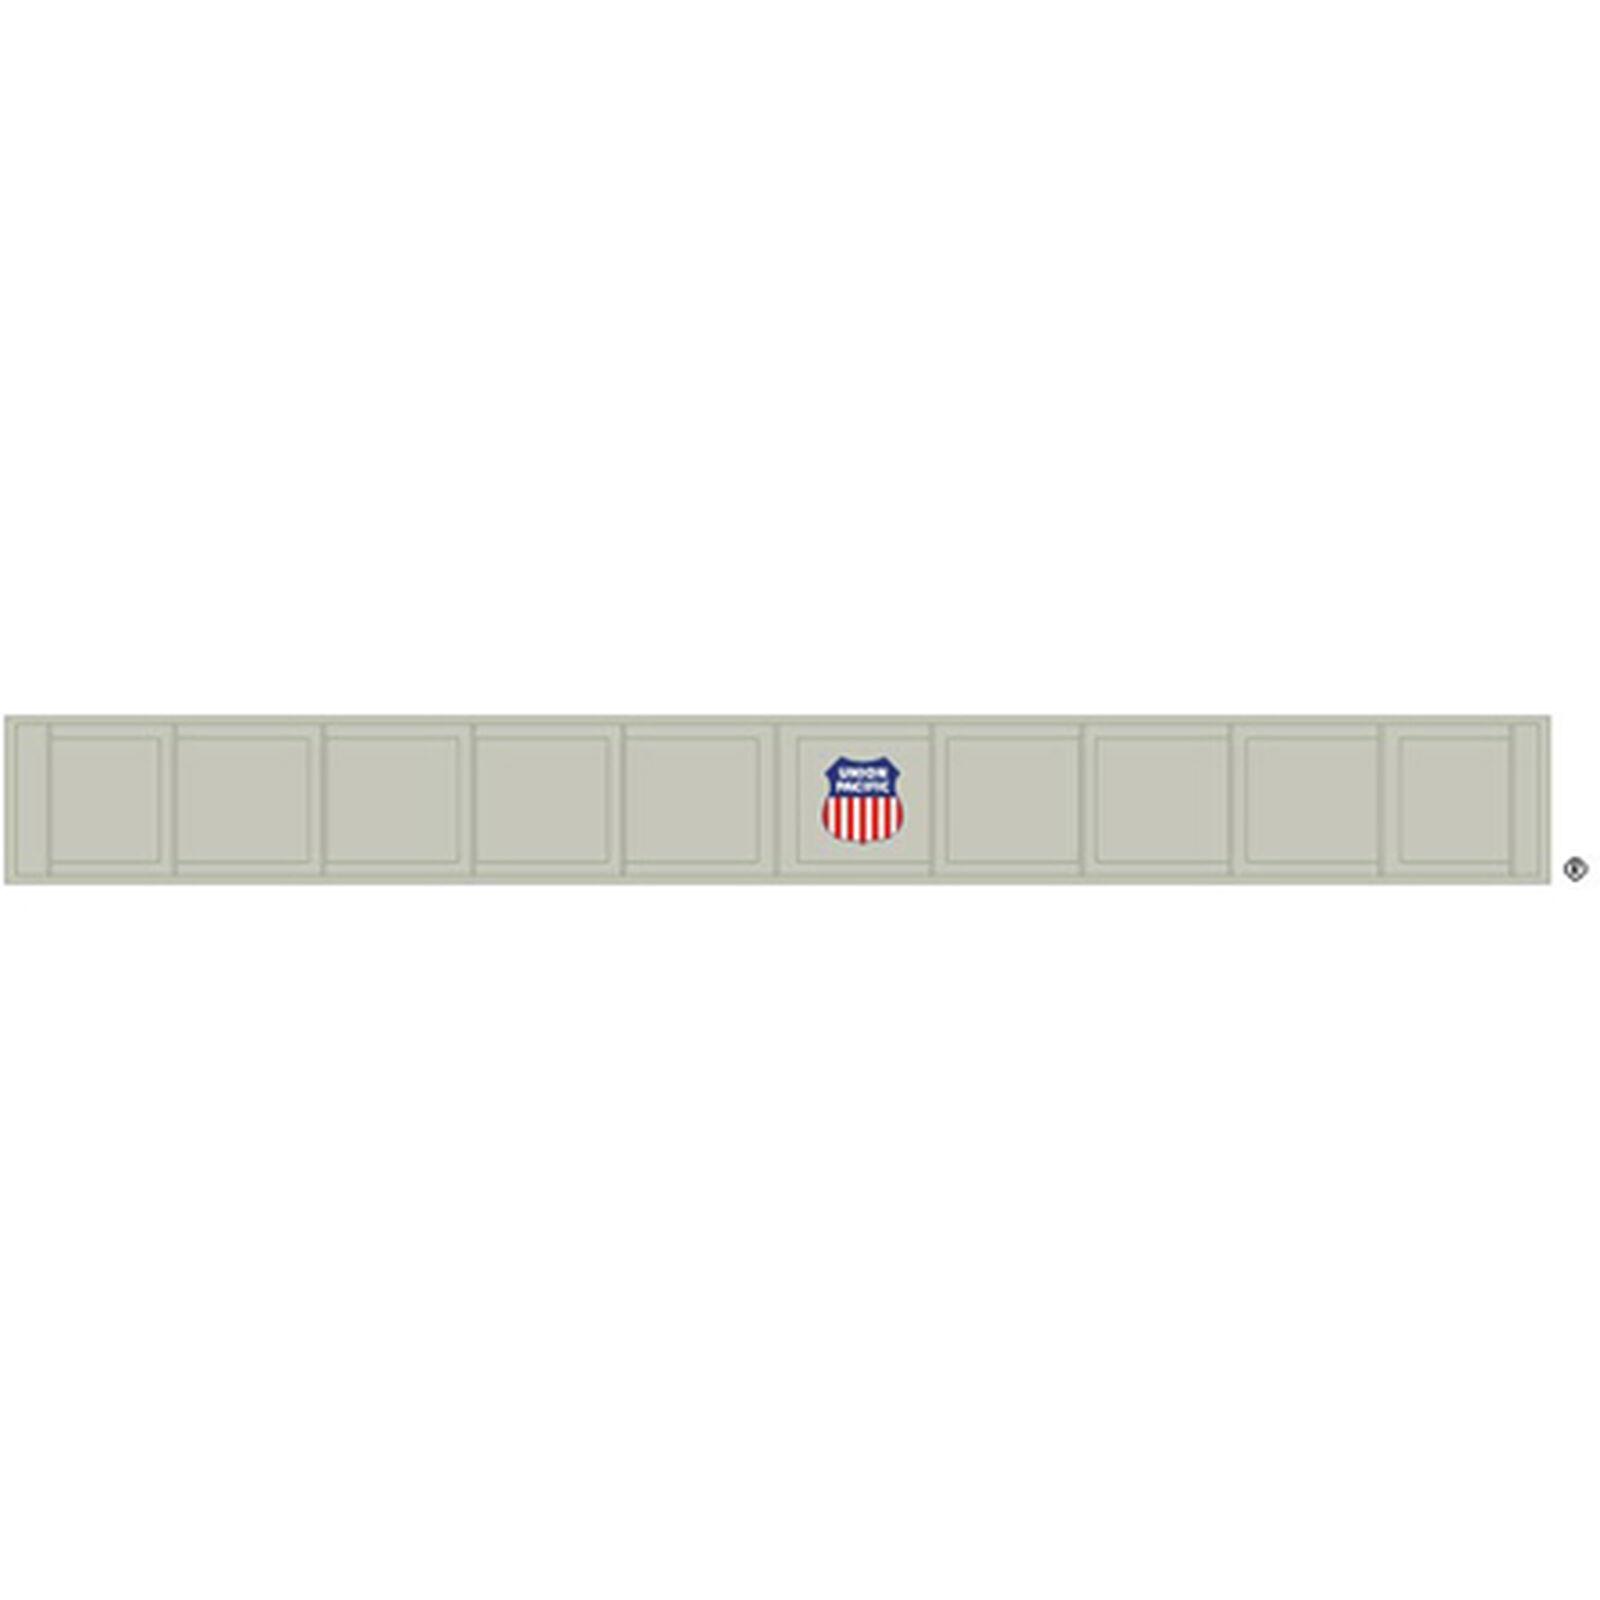 HO Code 100 Plate Girder Bridge, UP